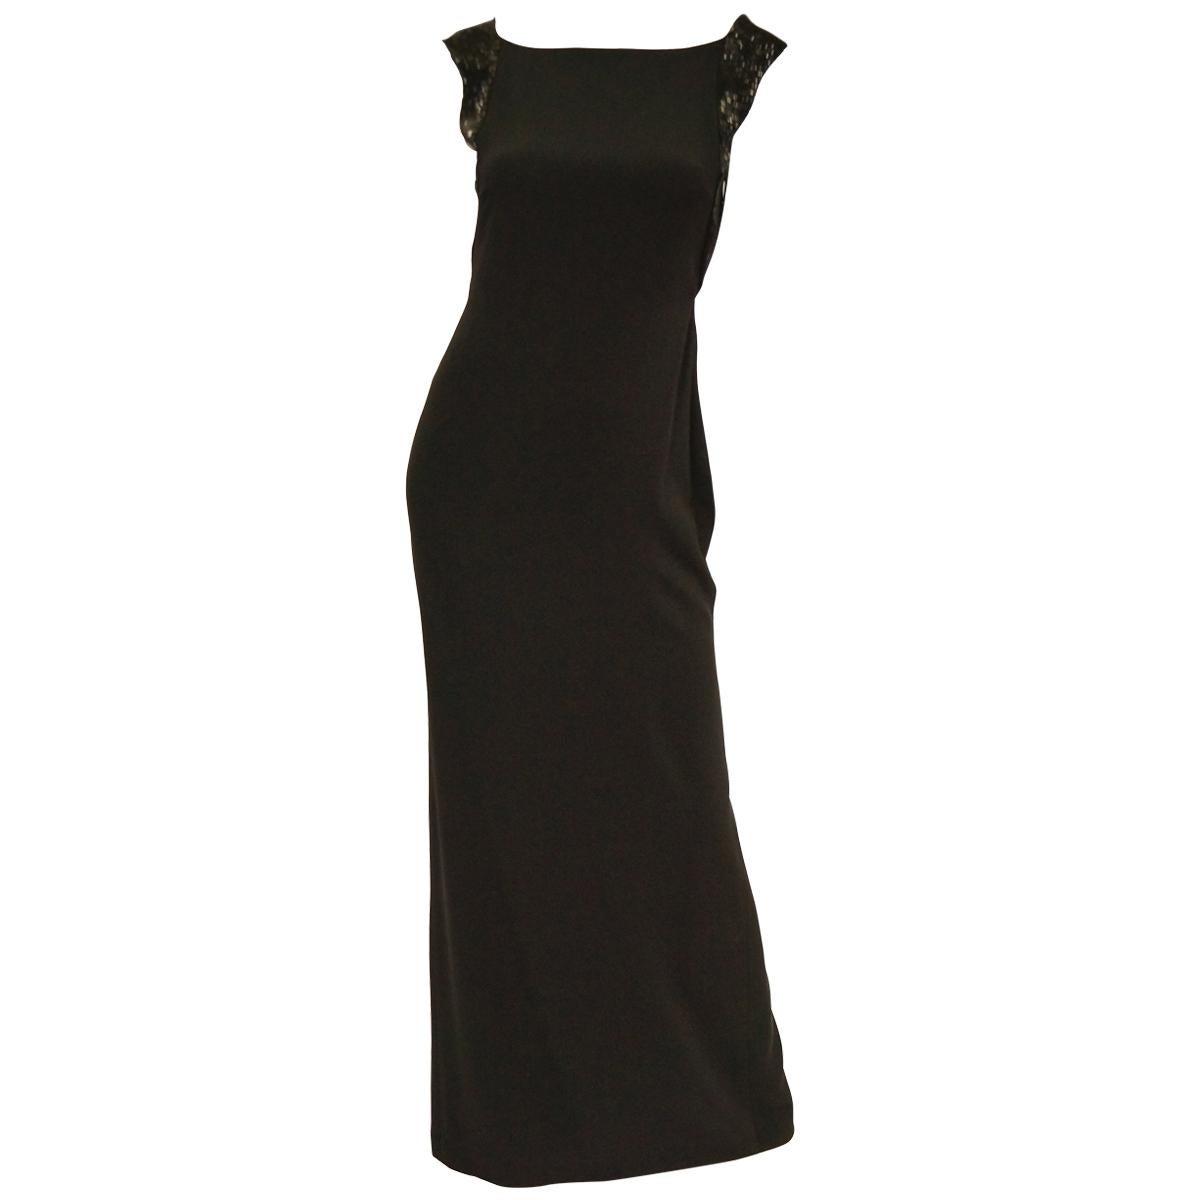 Richard Tyler Couture Black Silk & Sequin Plunge Back Dress